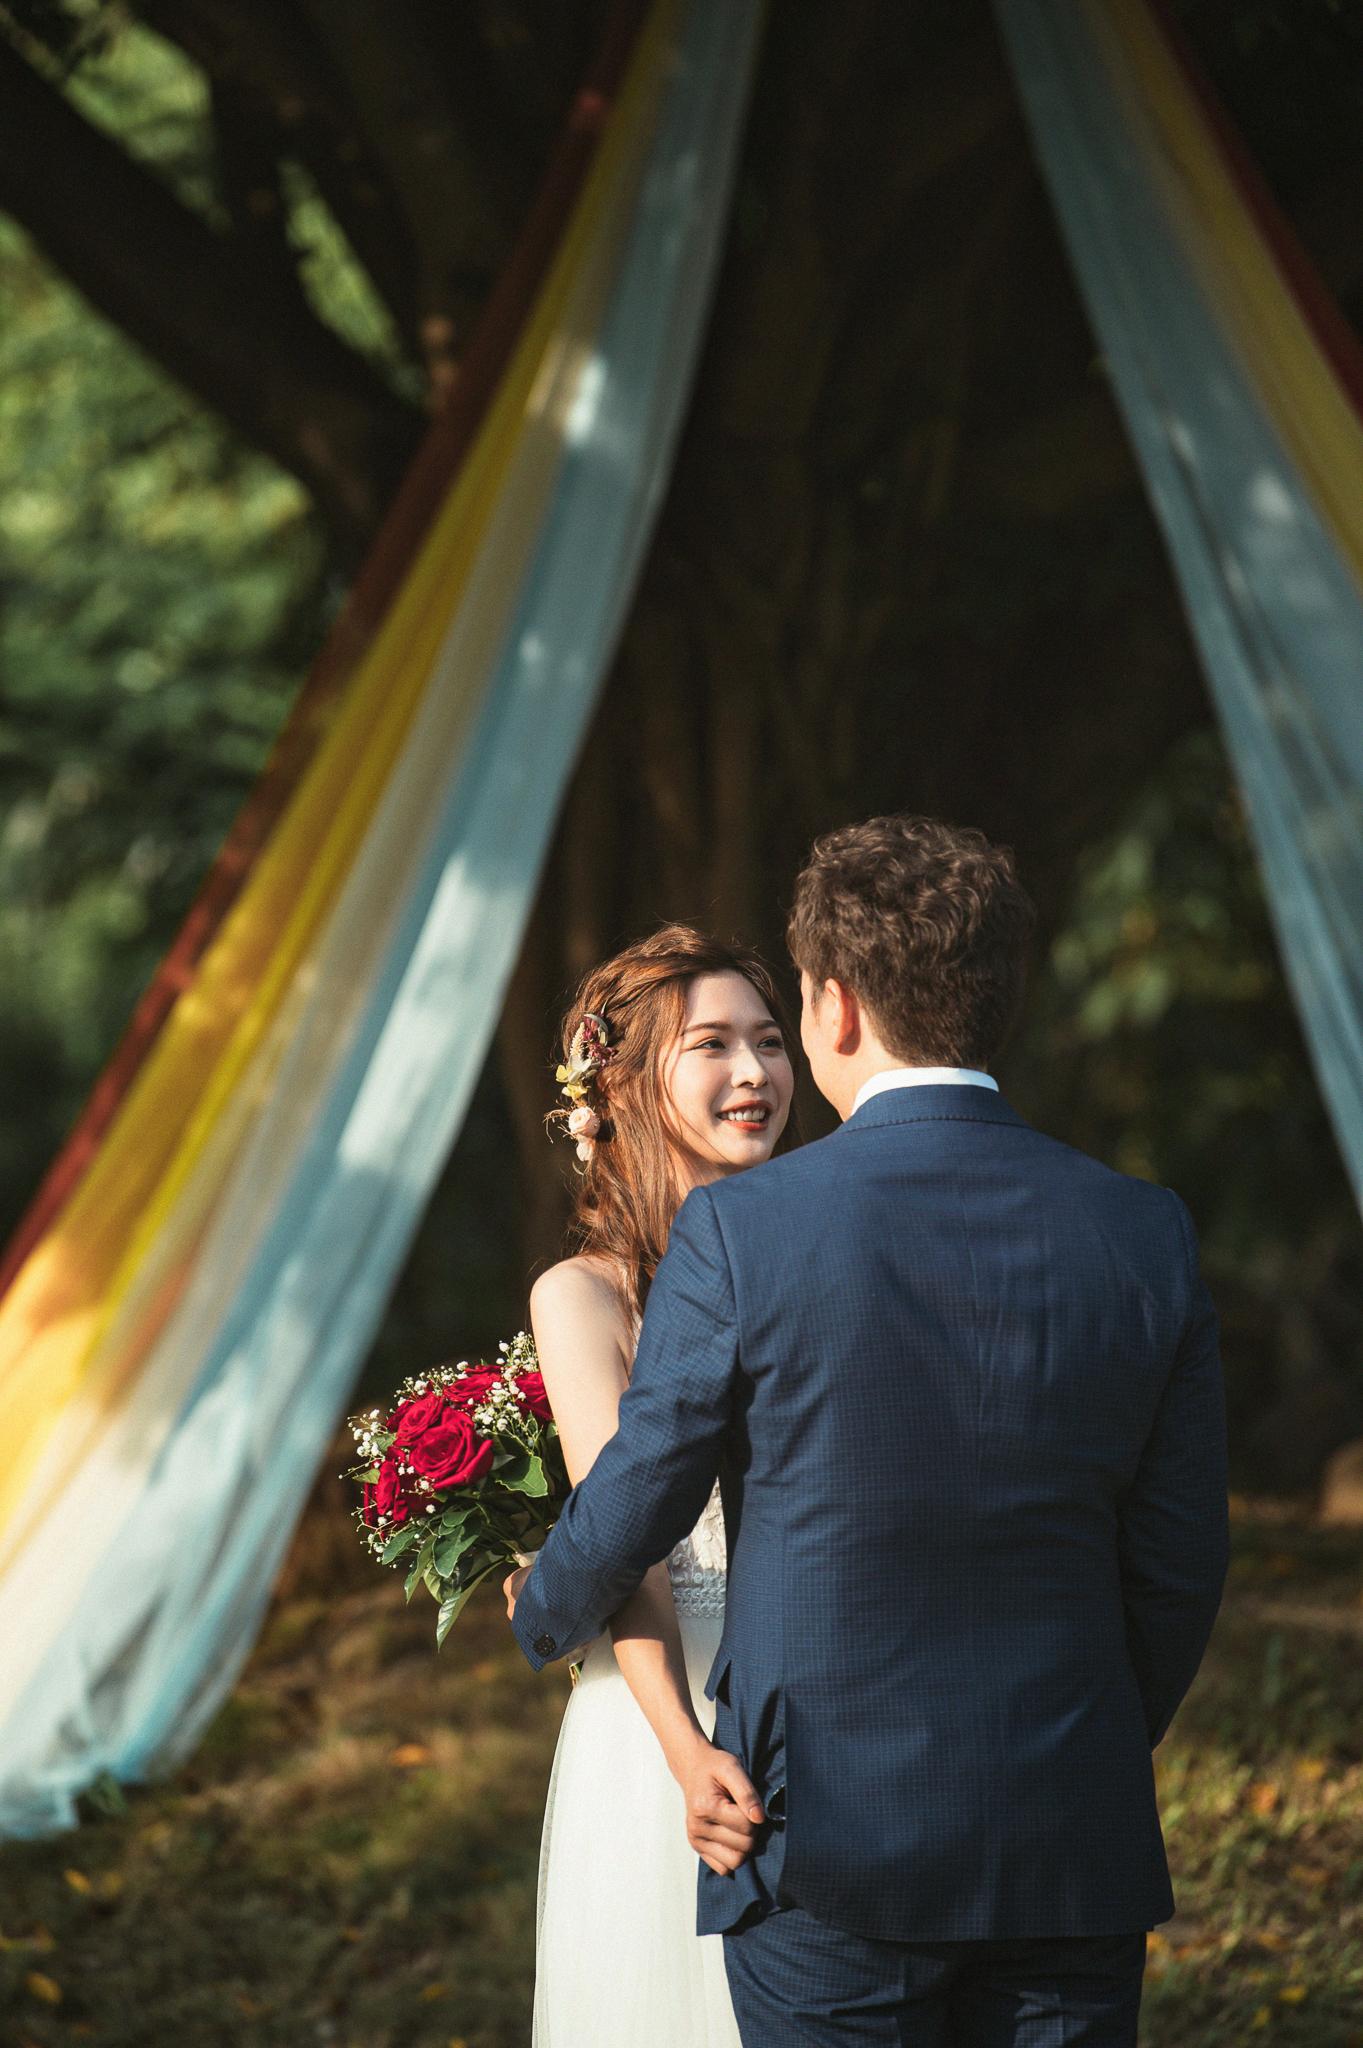 EASTERN WEDDING 婚攝小亮 婚禮紀錄 自助婚紗